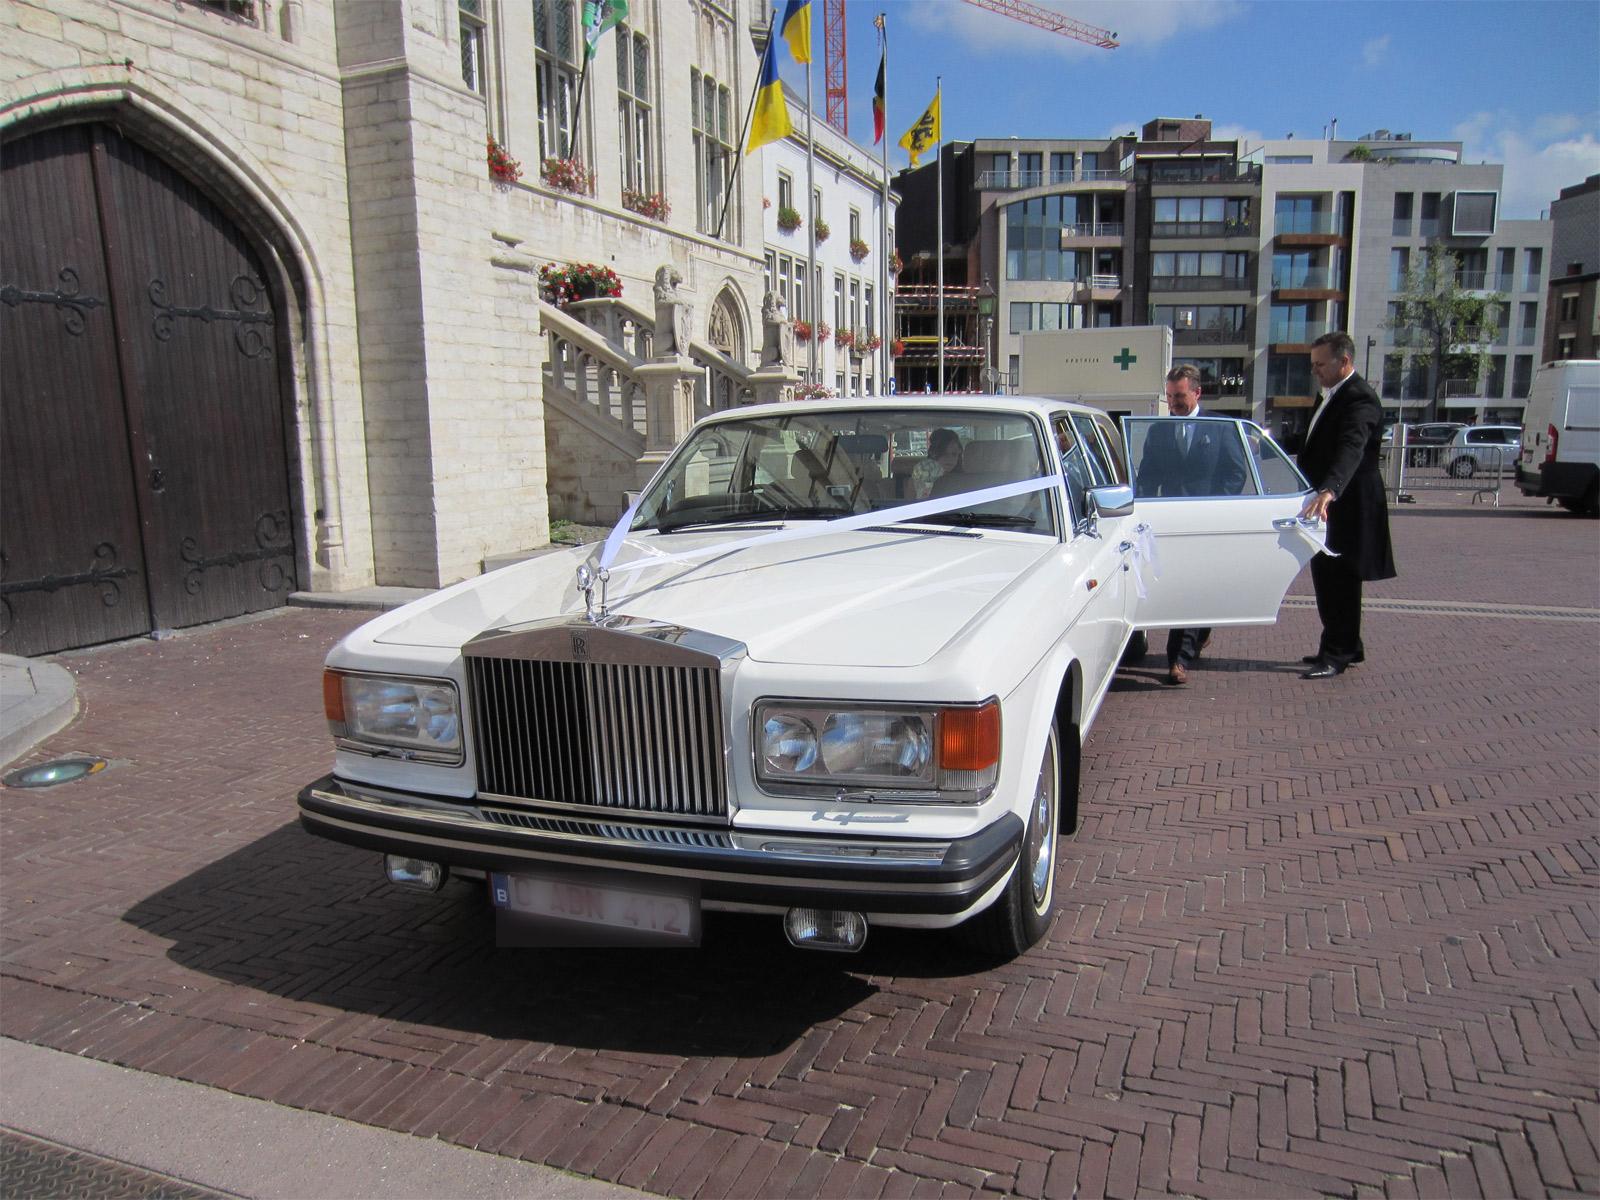 Rolls-royce Spirit Limo White